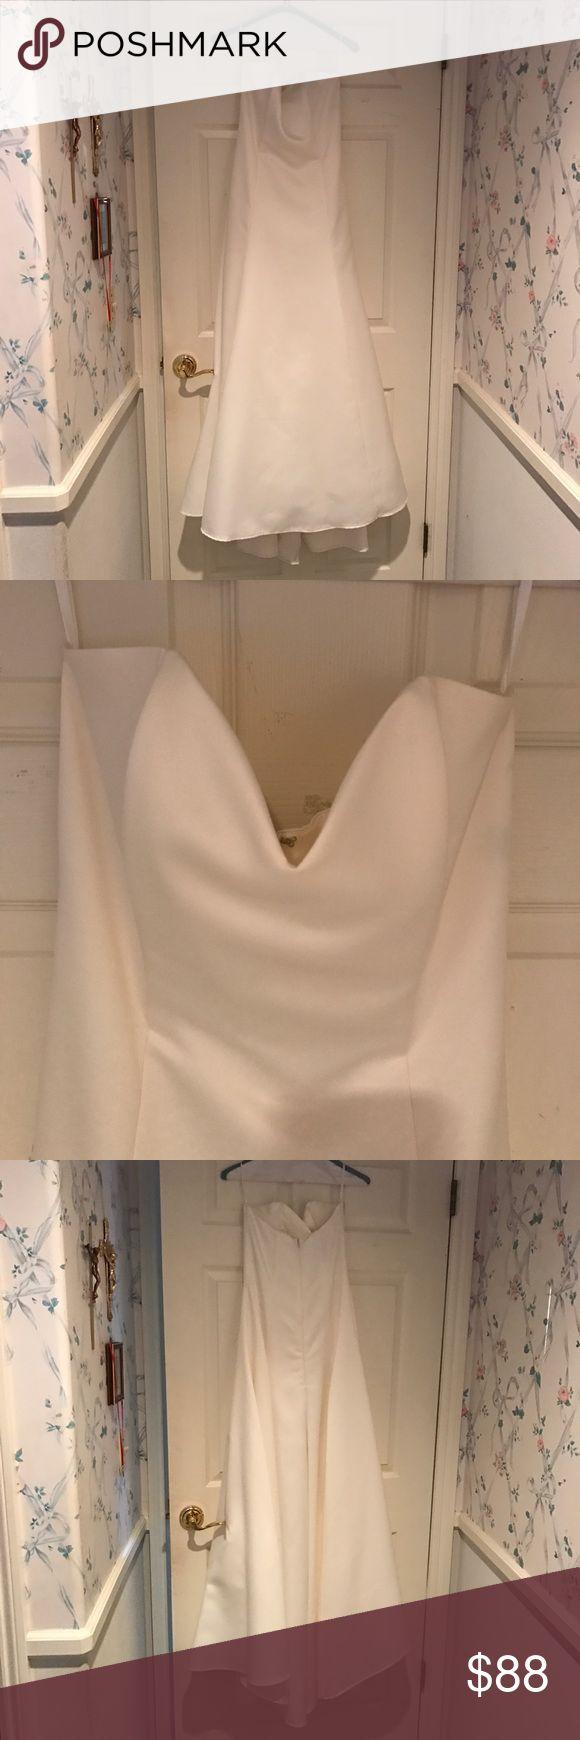 Spotted while shopping on Poshmark: Jessica McClintock Wedding Gown! #poshmark #fashion #shopping #style #Jessica McClintock #Dresses & Skirts